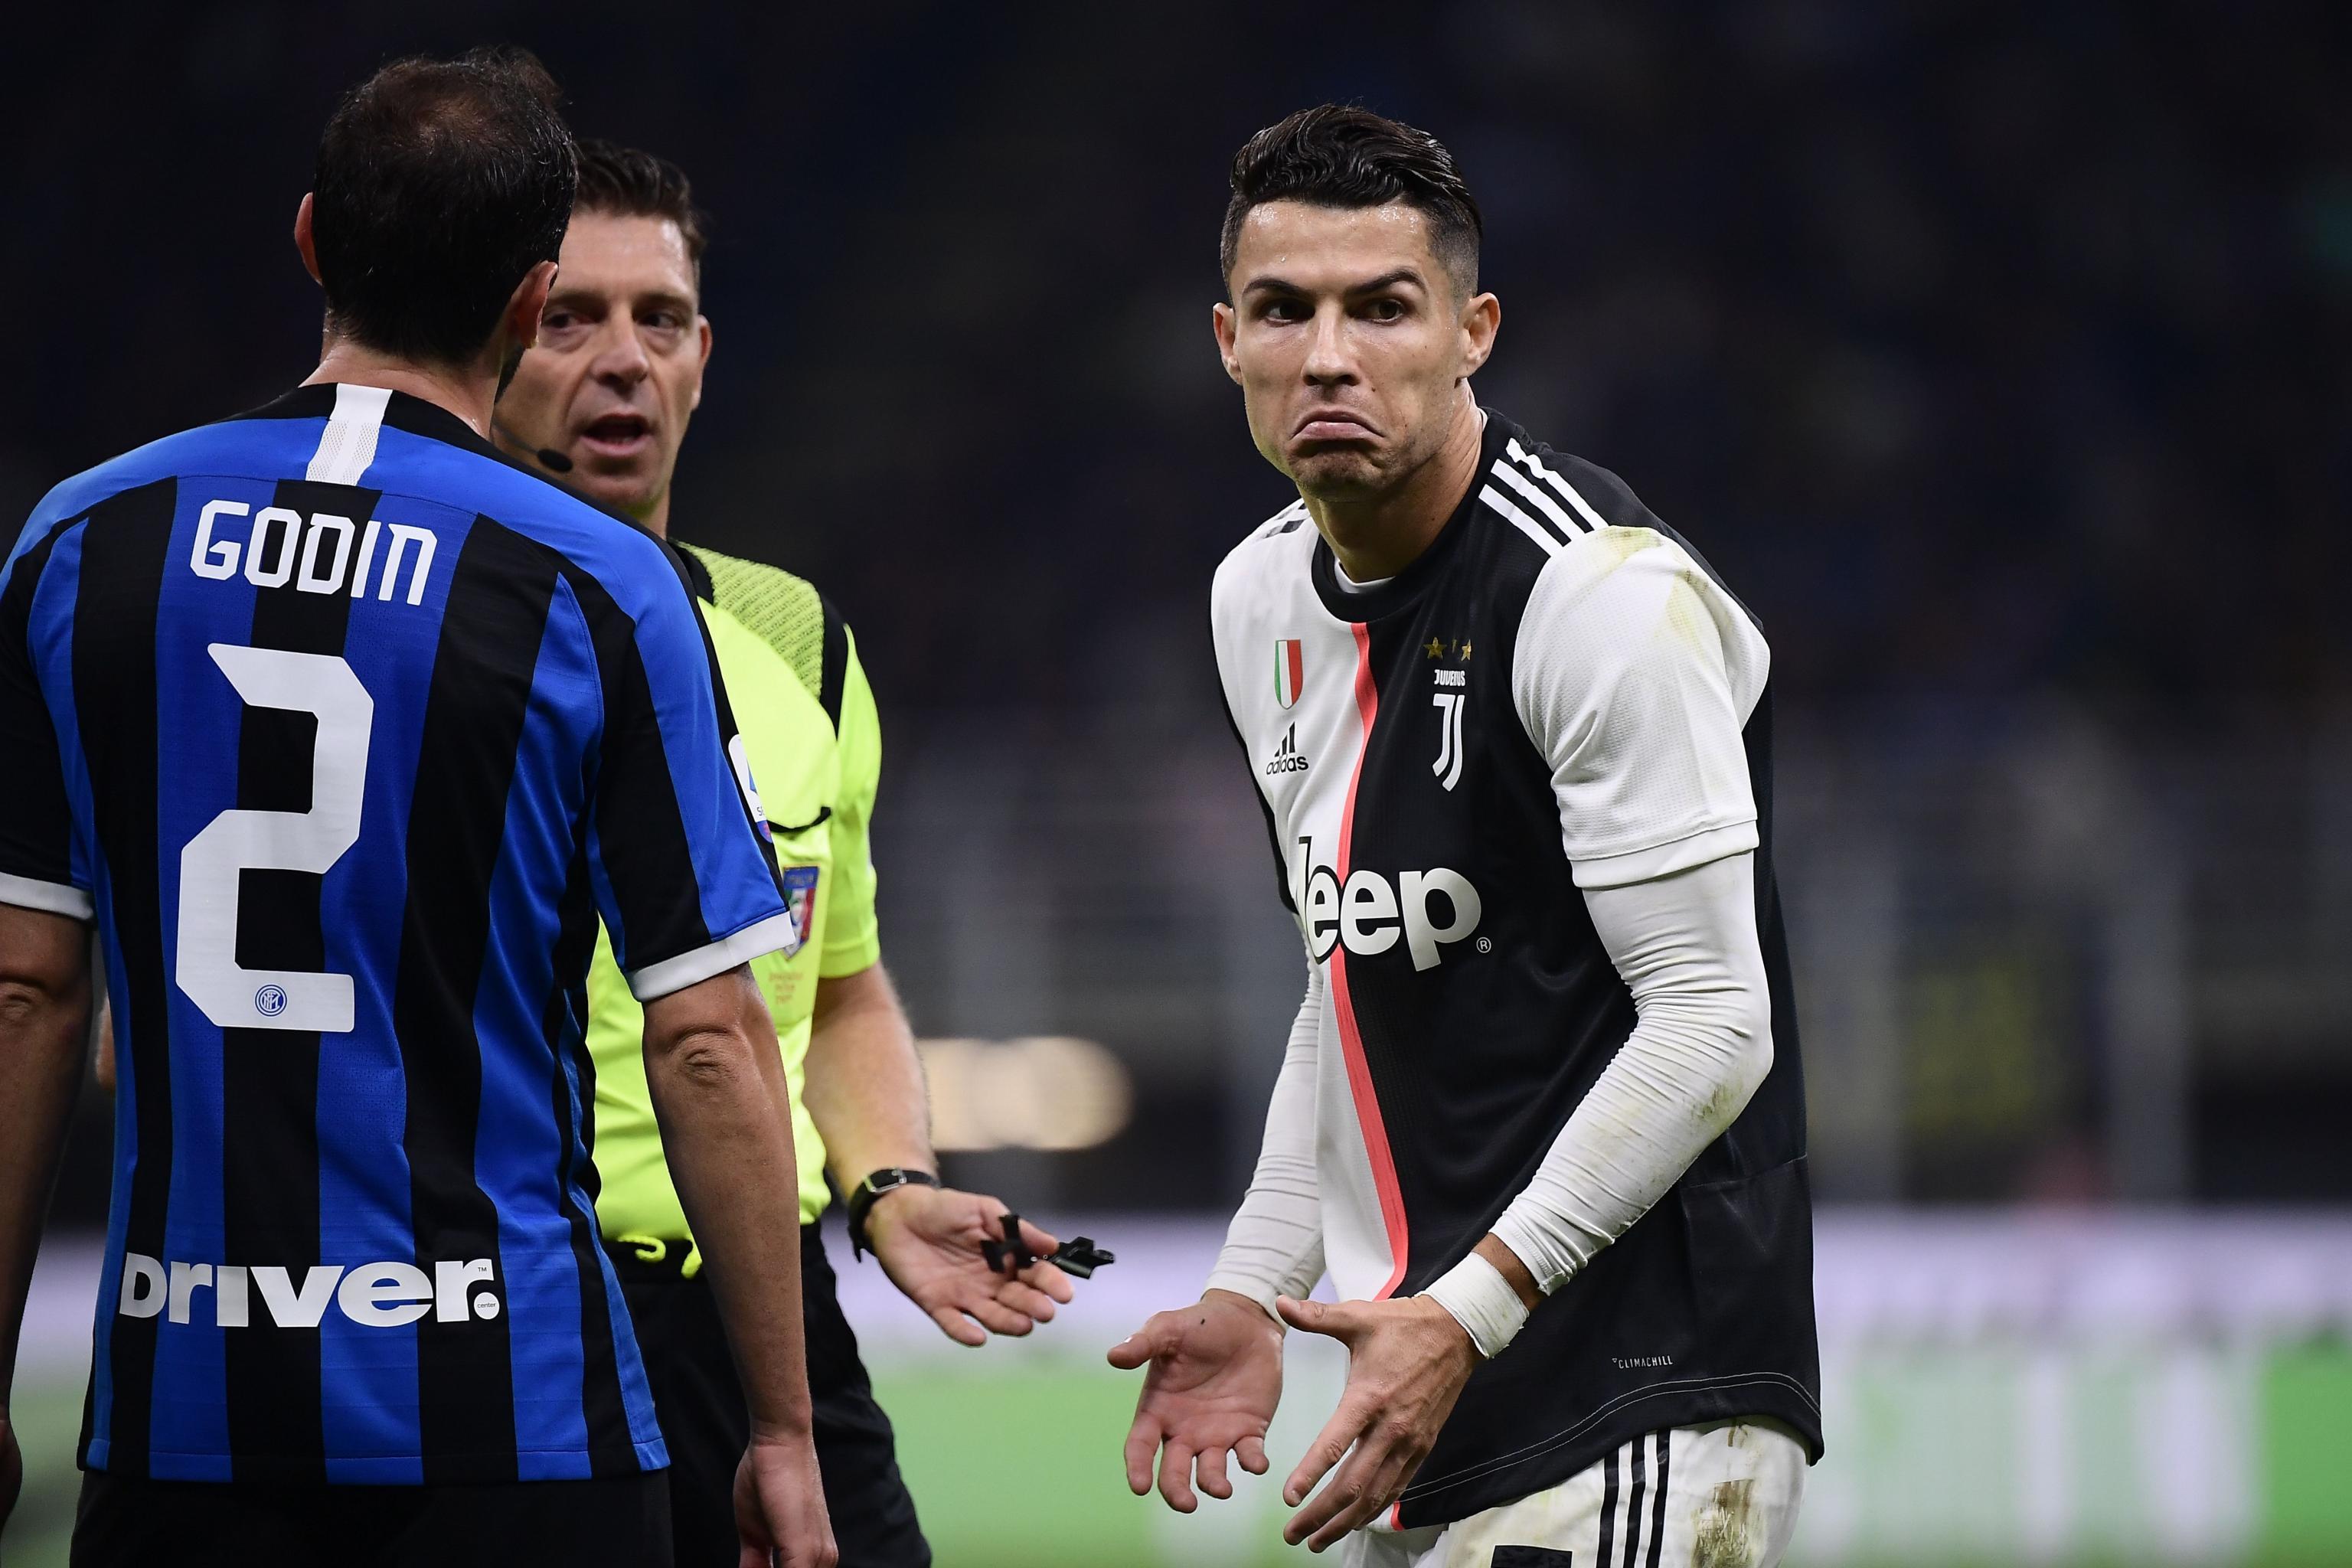 Juventus Vs Inter Milan Set For March 8 After Postponement Over Coronavirus Bleacher Report Latest News Videos And Highlights